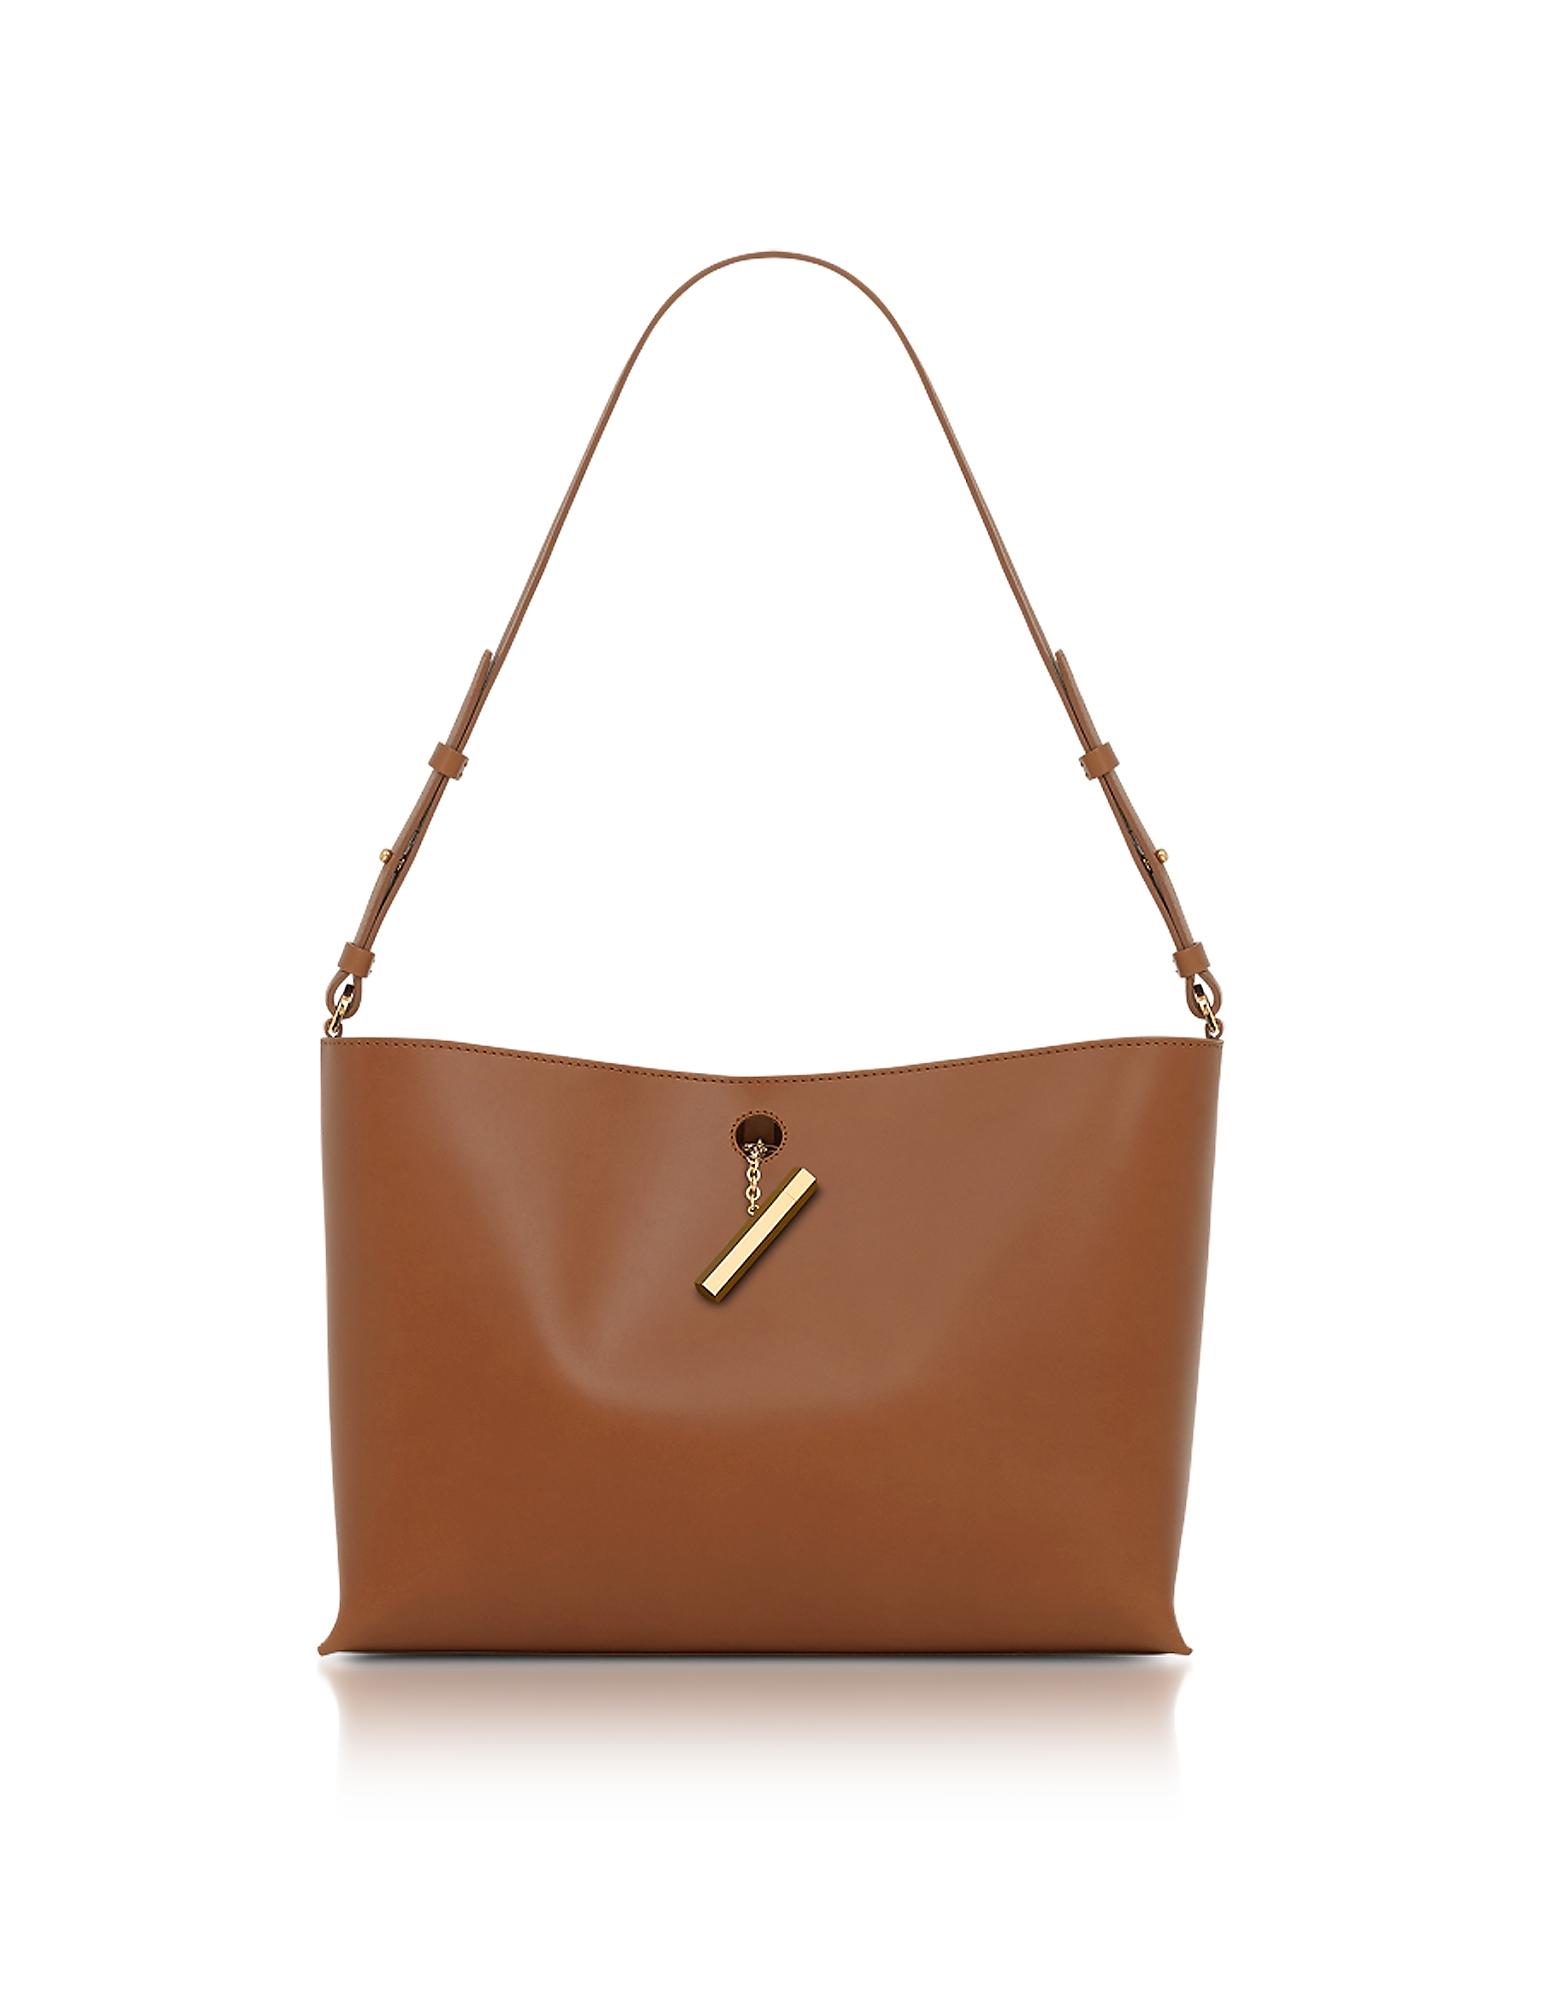 Sophie Hulme Handbags, Tan Medium Pinch Shoulder Bag